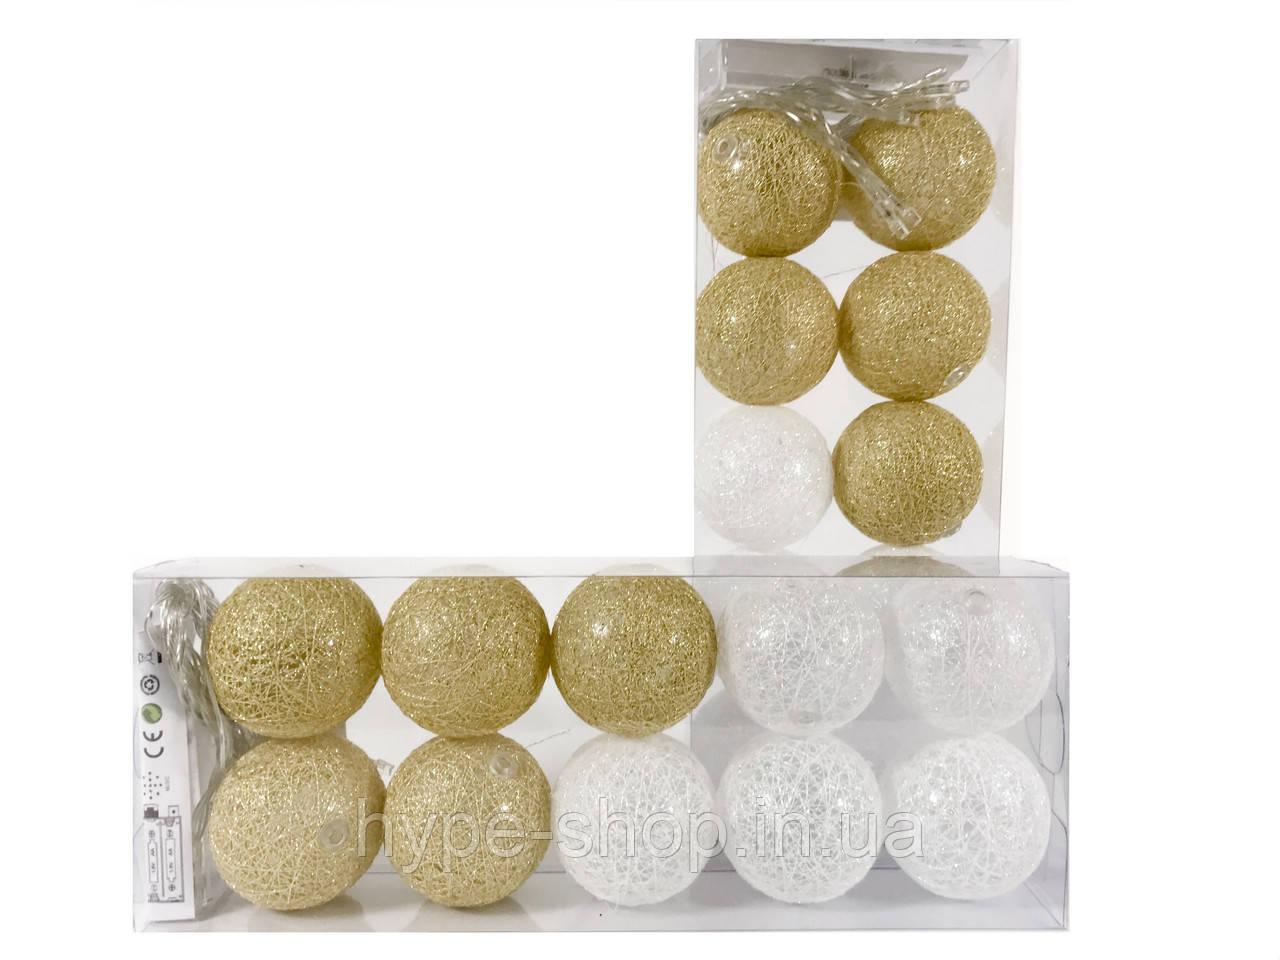 Гірлянда тайські кульки Decorino GoldWhite Cotton Balls 10led, діам 6см, довжина 235см на батарейках АА